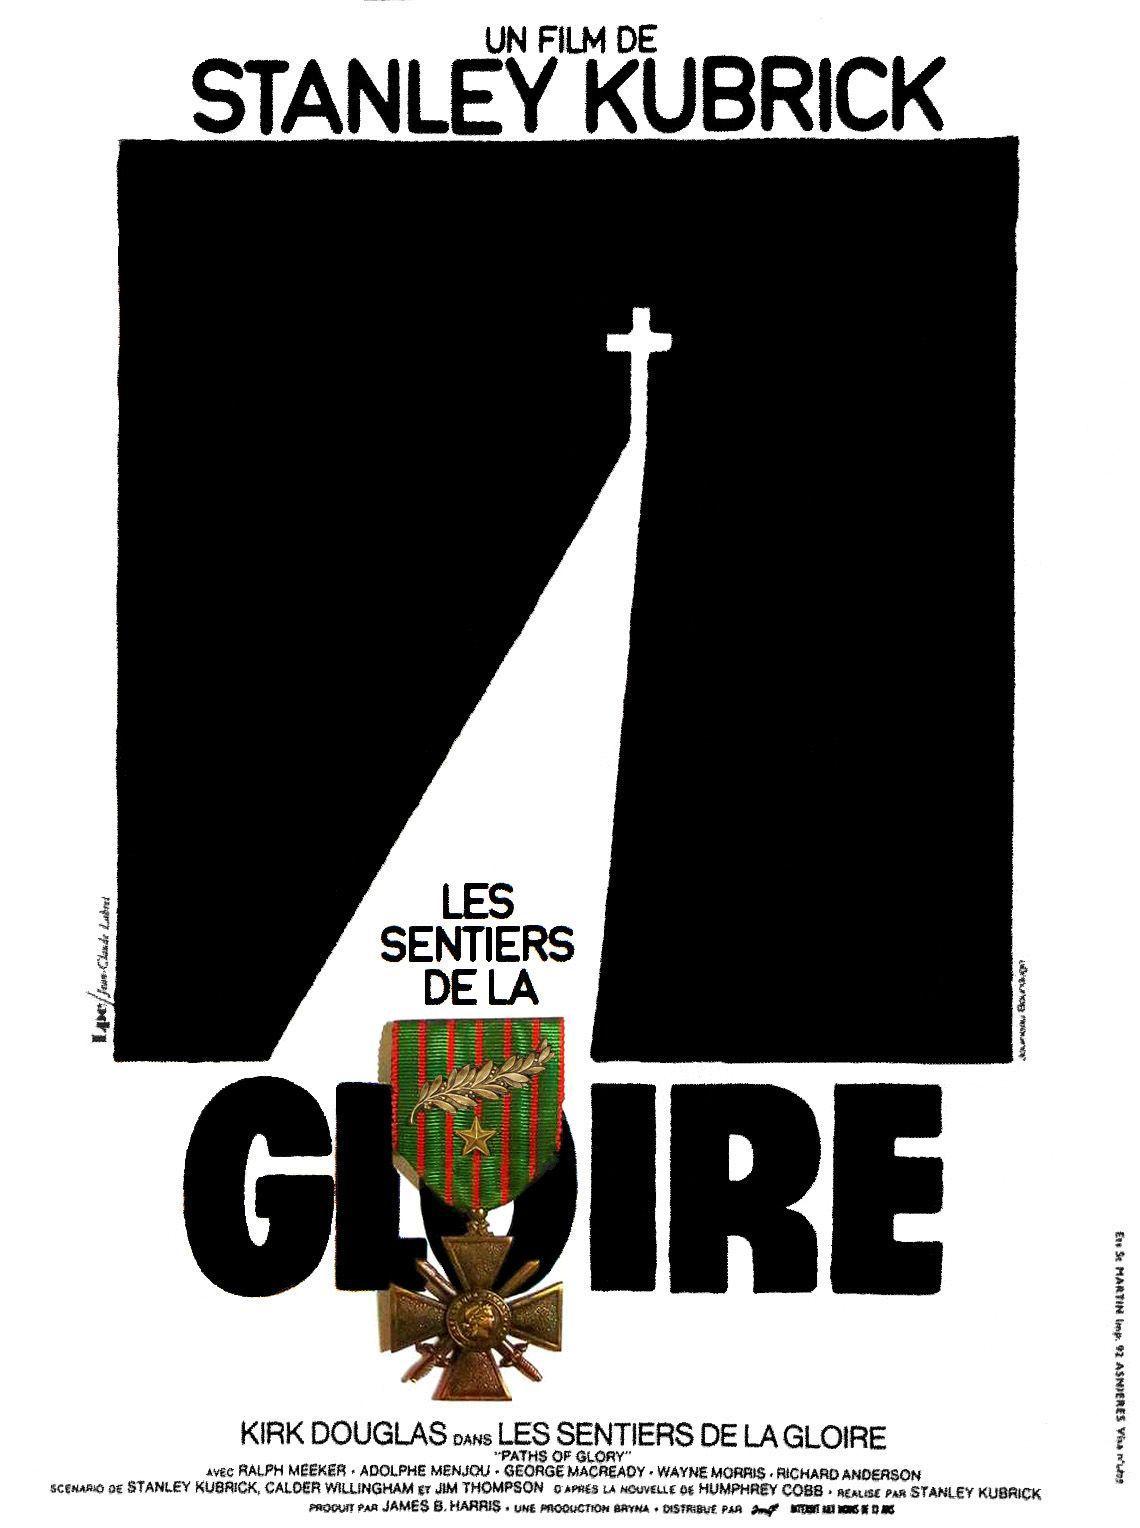 LES SENTIERS DE LA GLOIRE - Stanley Kubrick (1957)